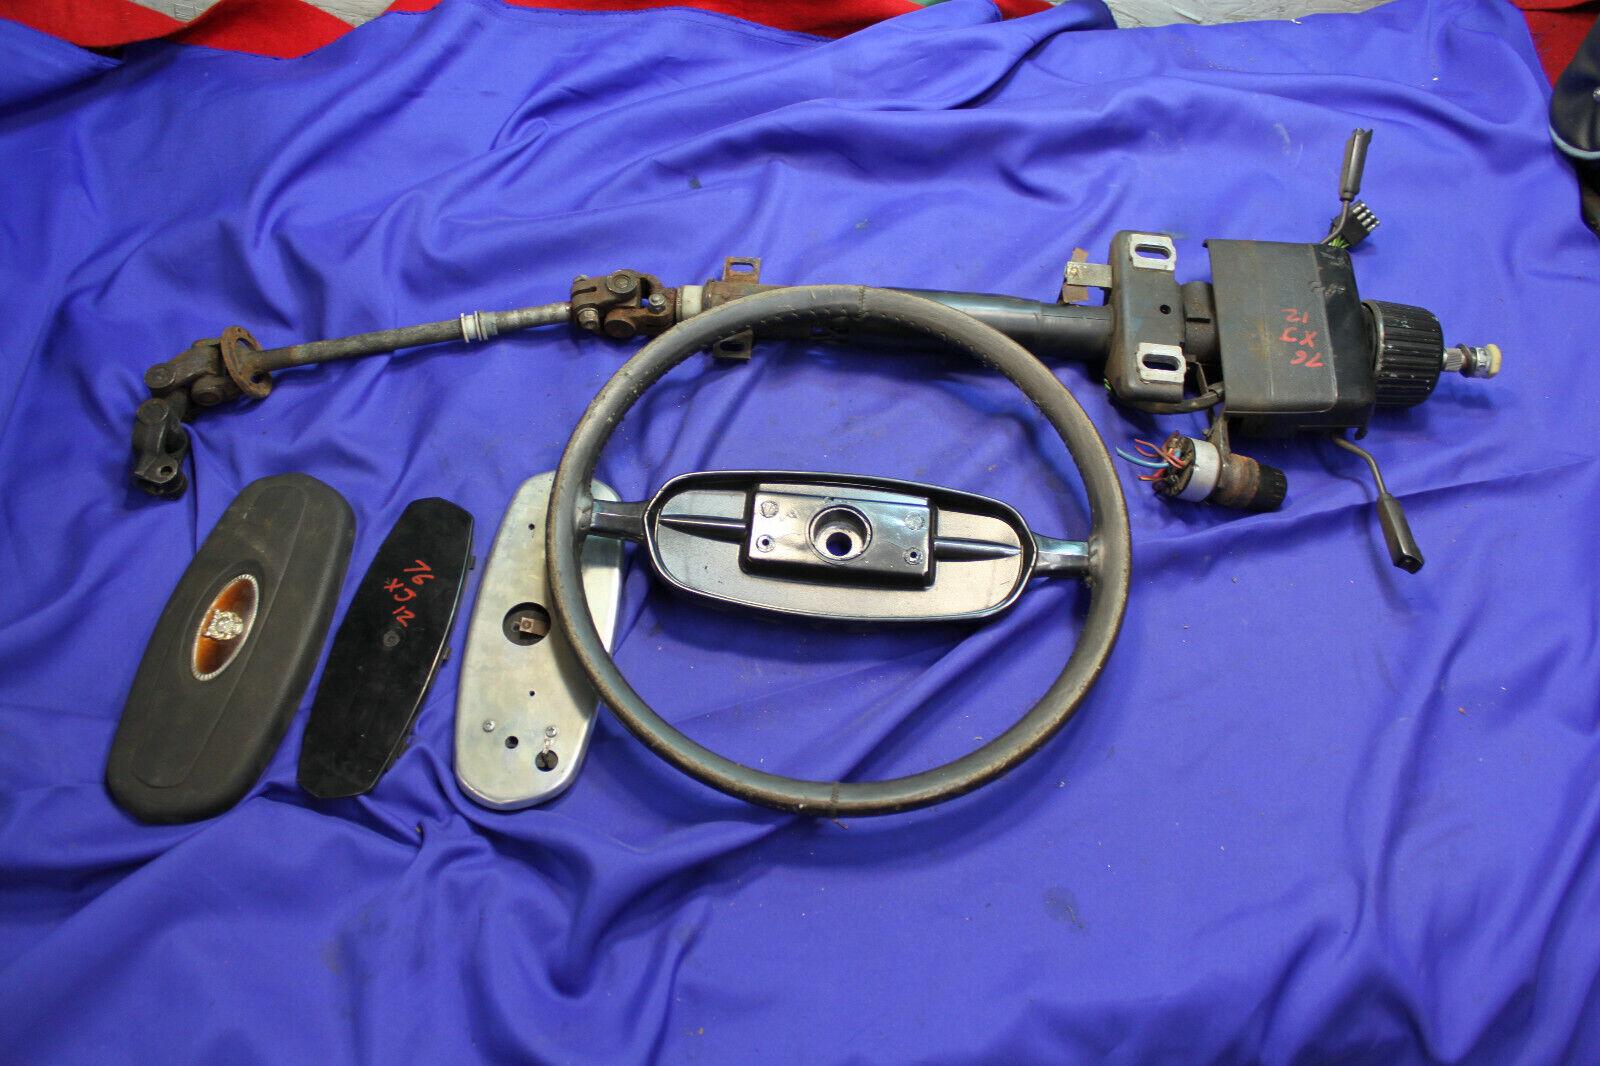 Jaguar XJ12 Upper Steering Colum Assembly and Steering Wheel